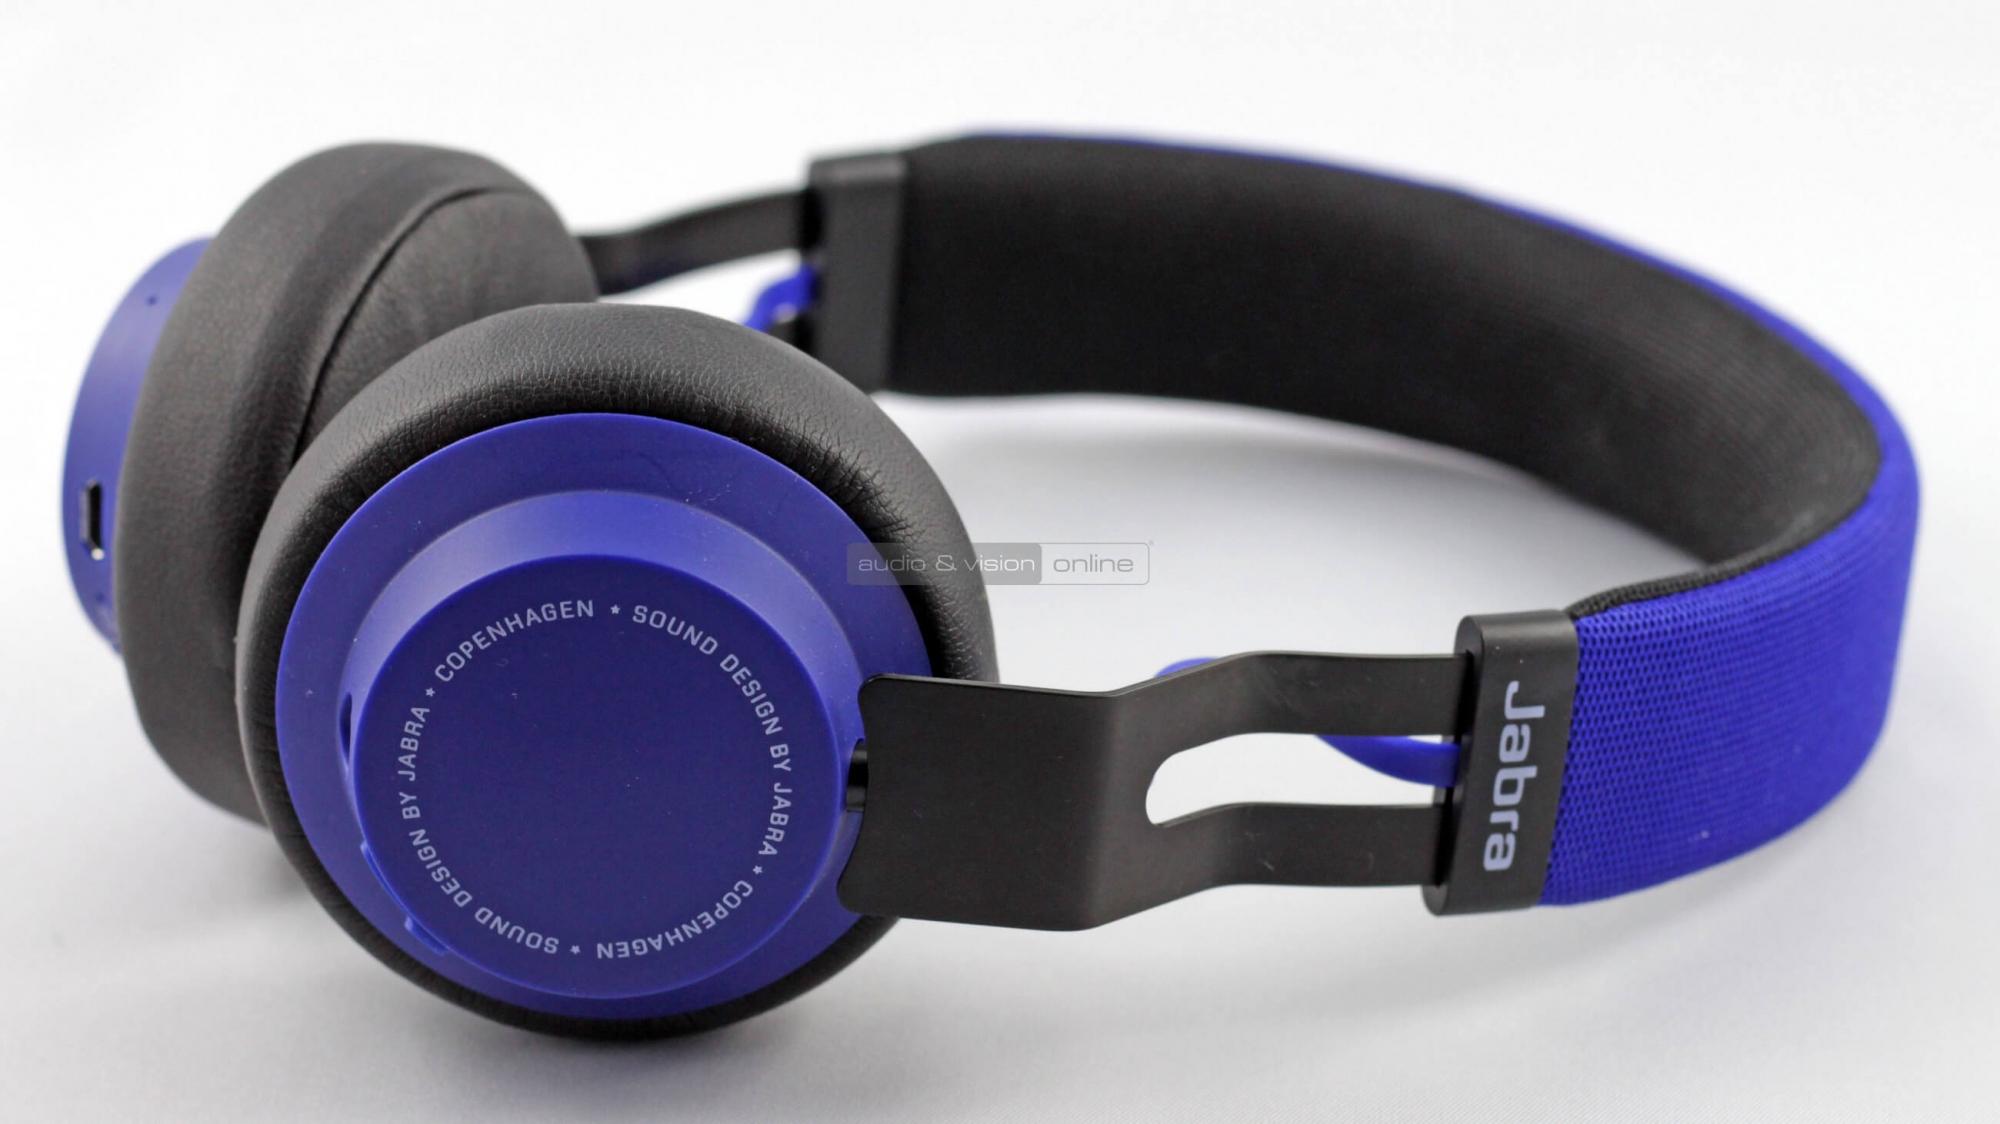 Jabra Move Wireless Bluetooth fejhallgató. Kattints ... a470bea995